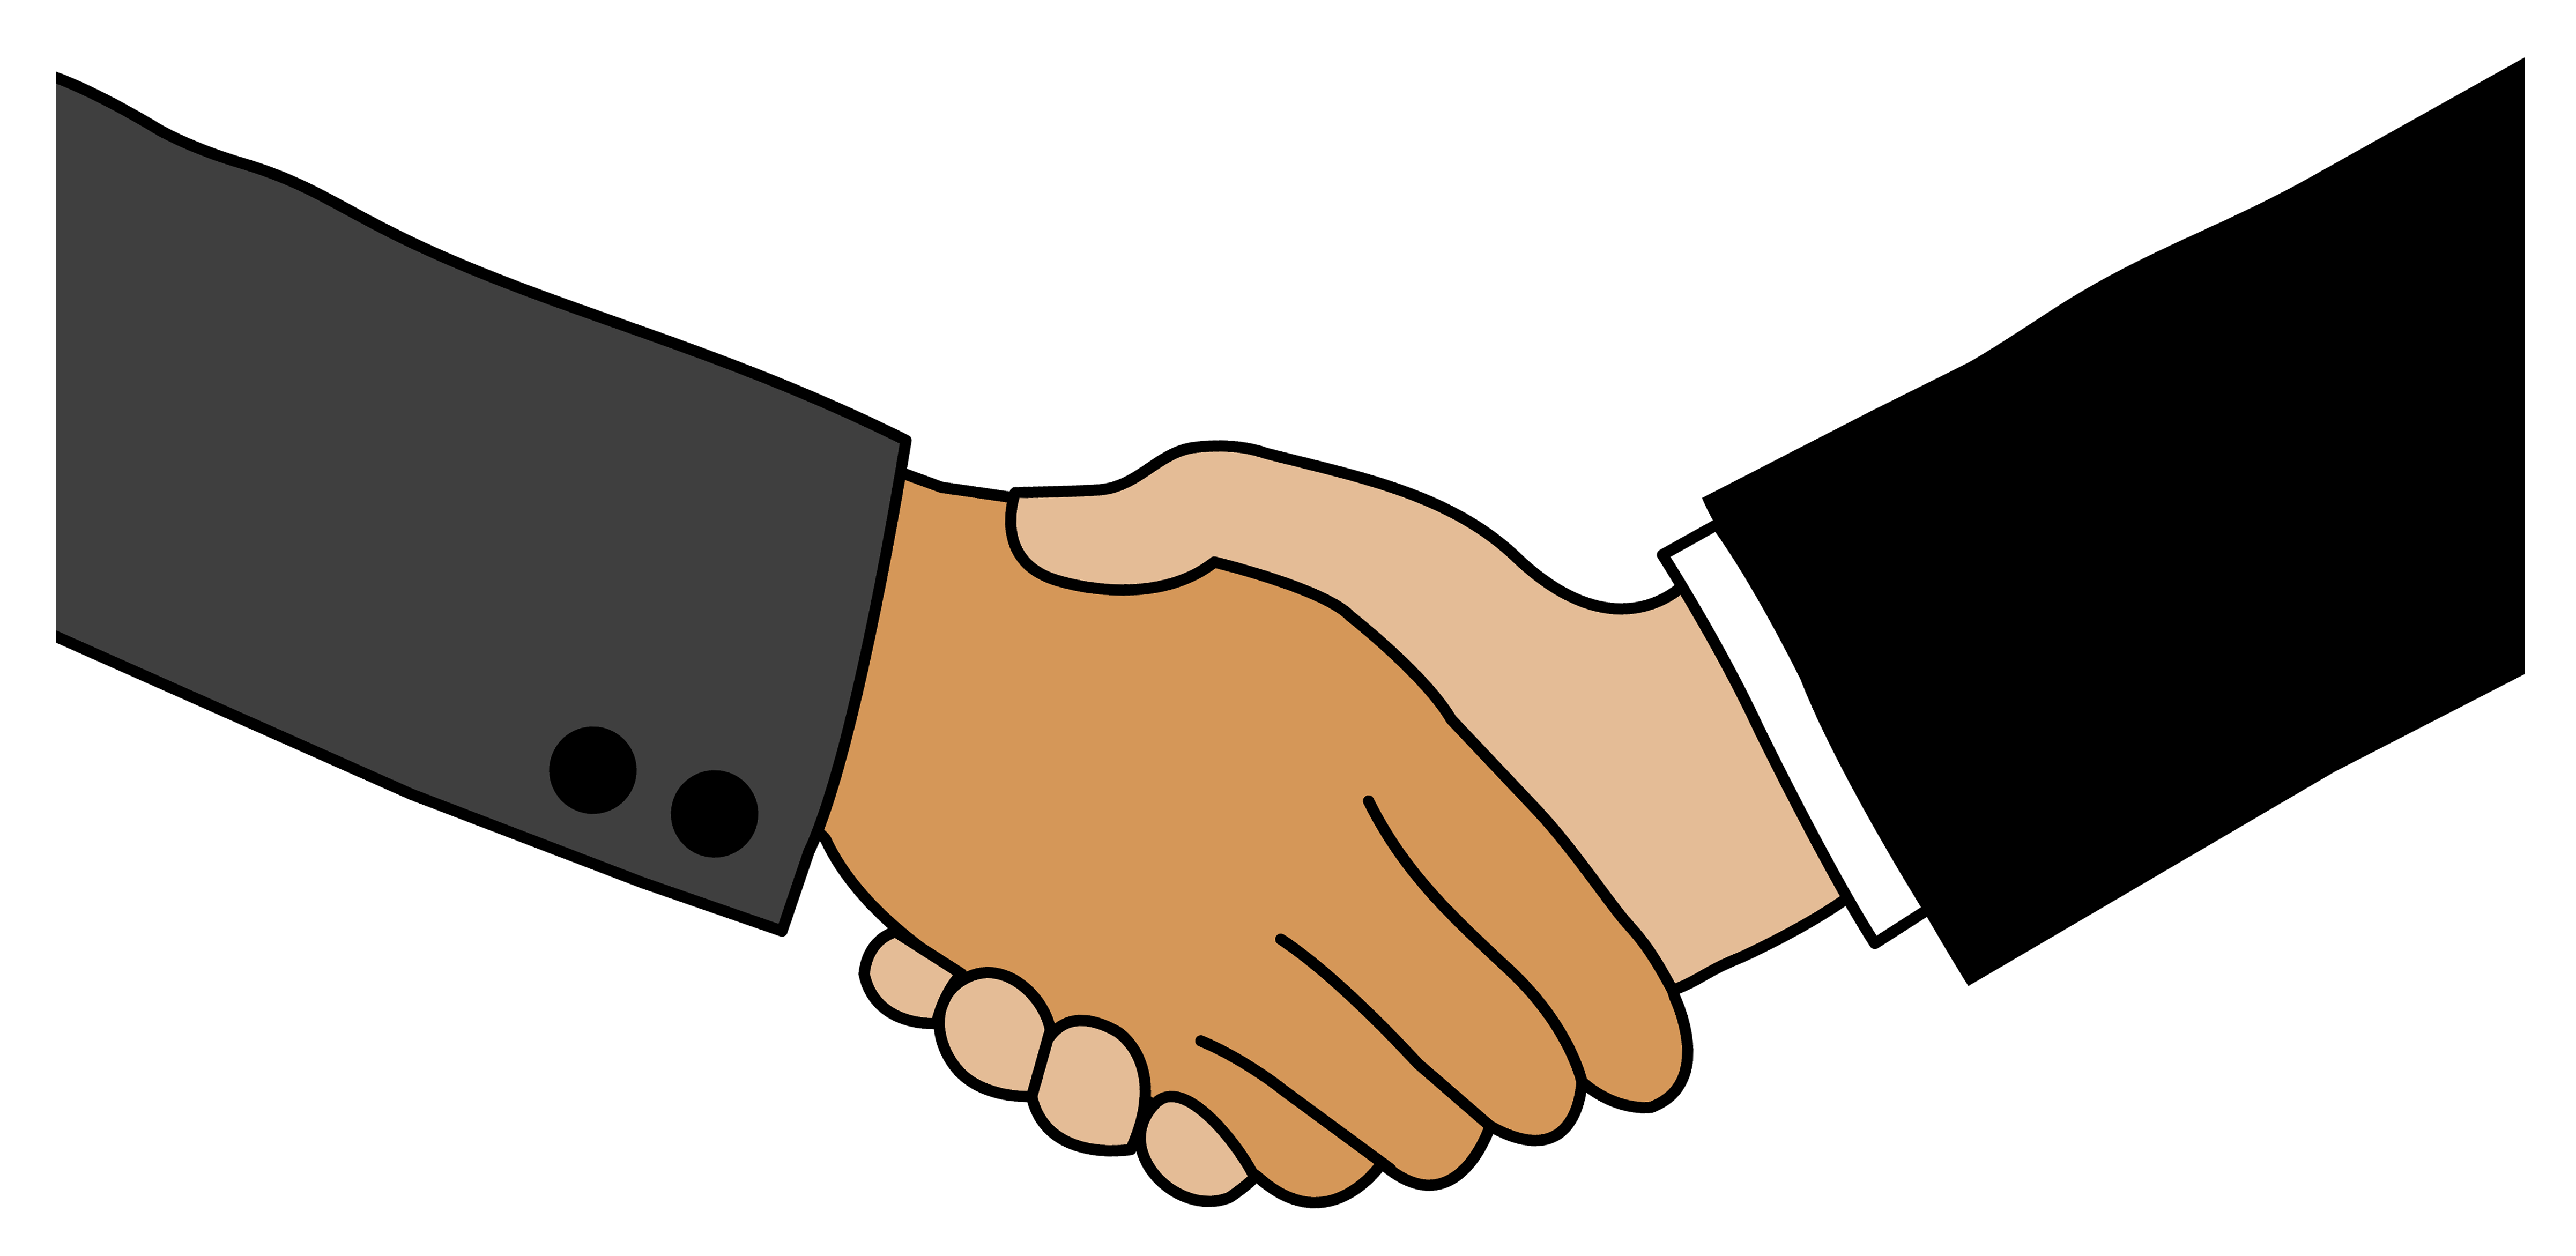 Handshake clipart trade. August usrevolution agreementclipartbusinesshandshake